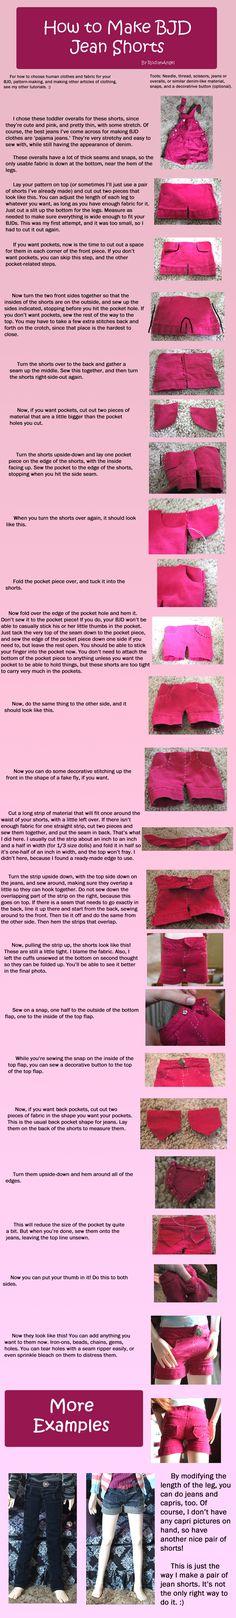 How to Make BJD Jean Shorts by RodianAngel.deviantart.com on @deviantART